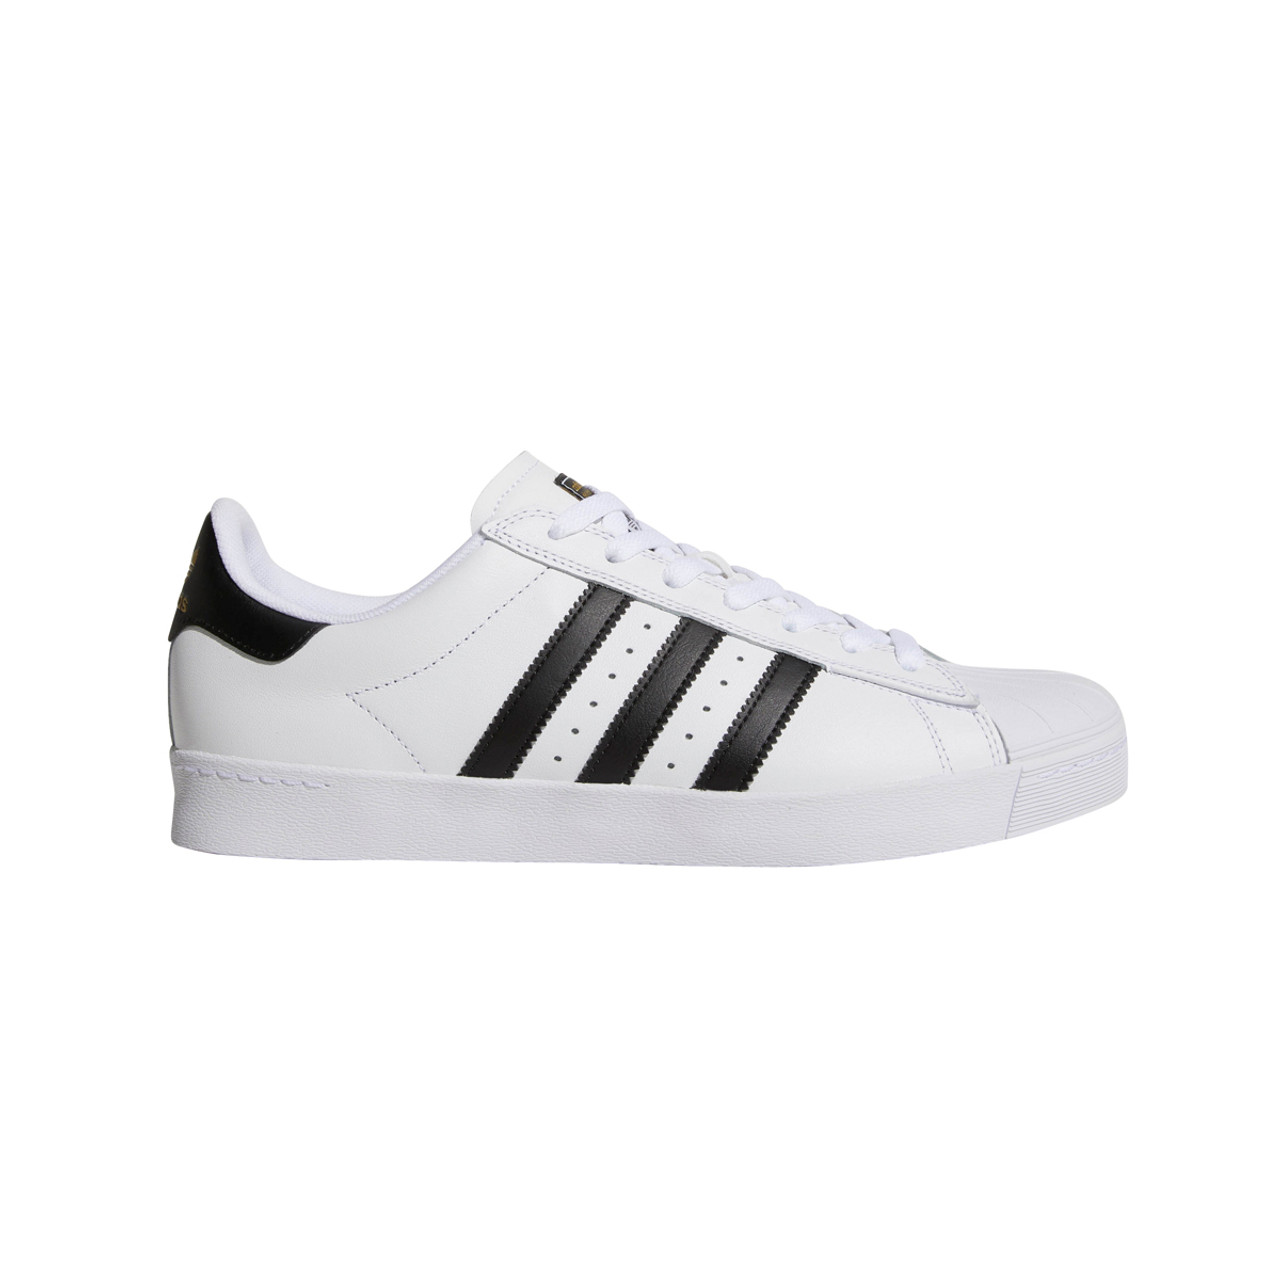 e3eaf1b299f34a Superstar Vulc - White Black - Val Surf